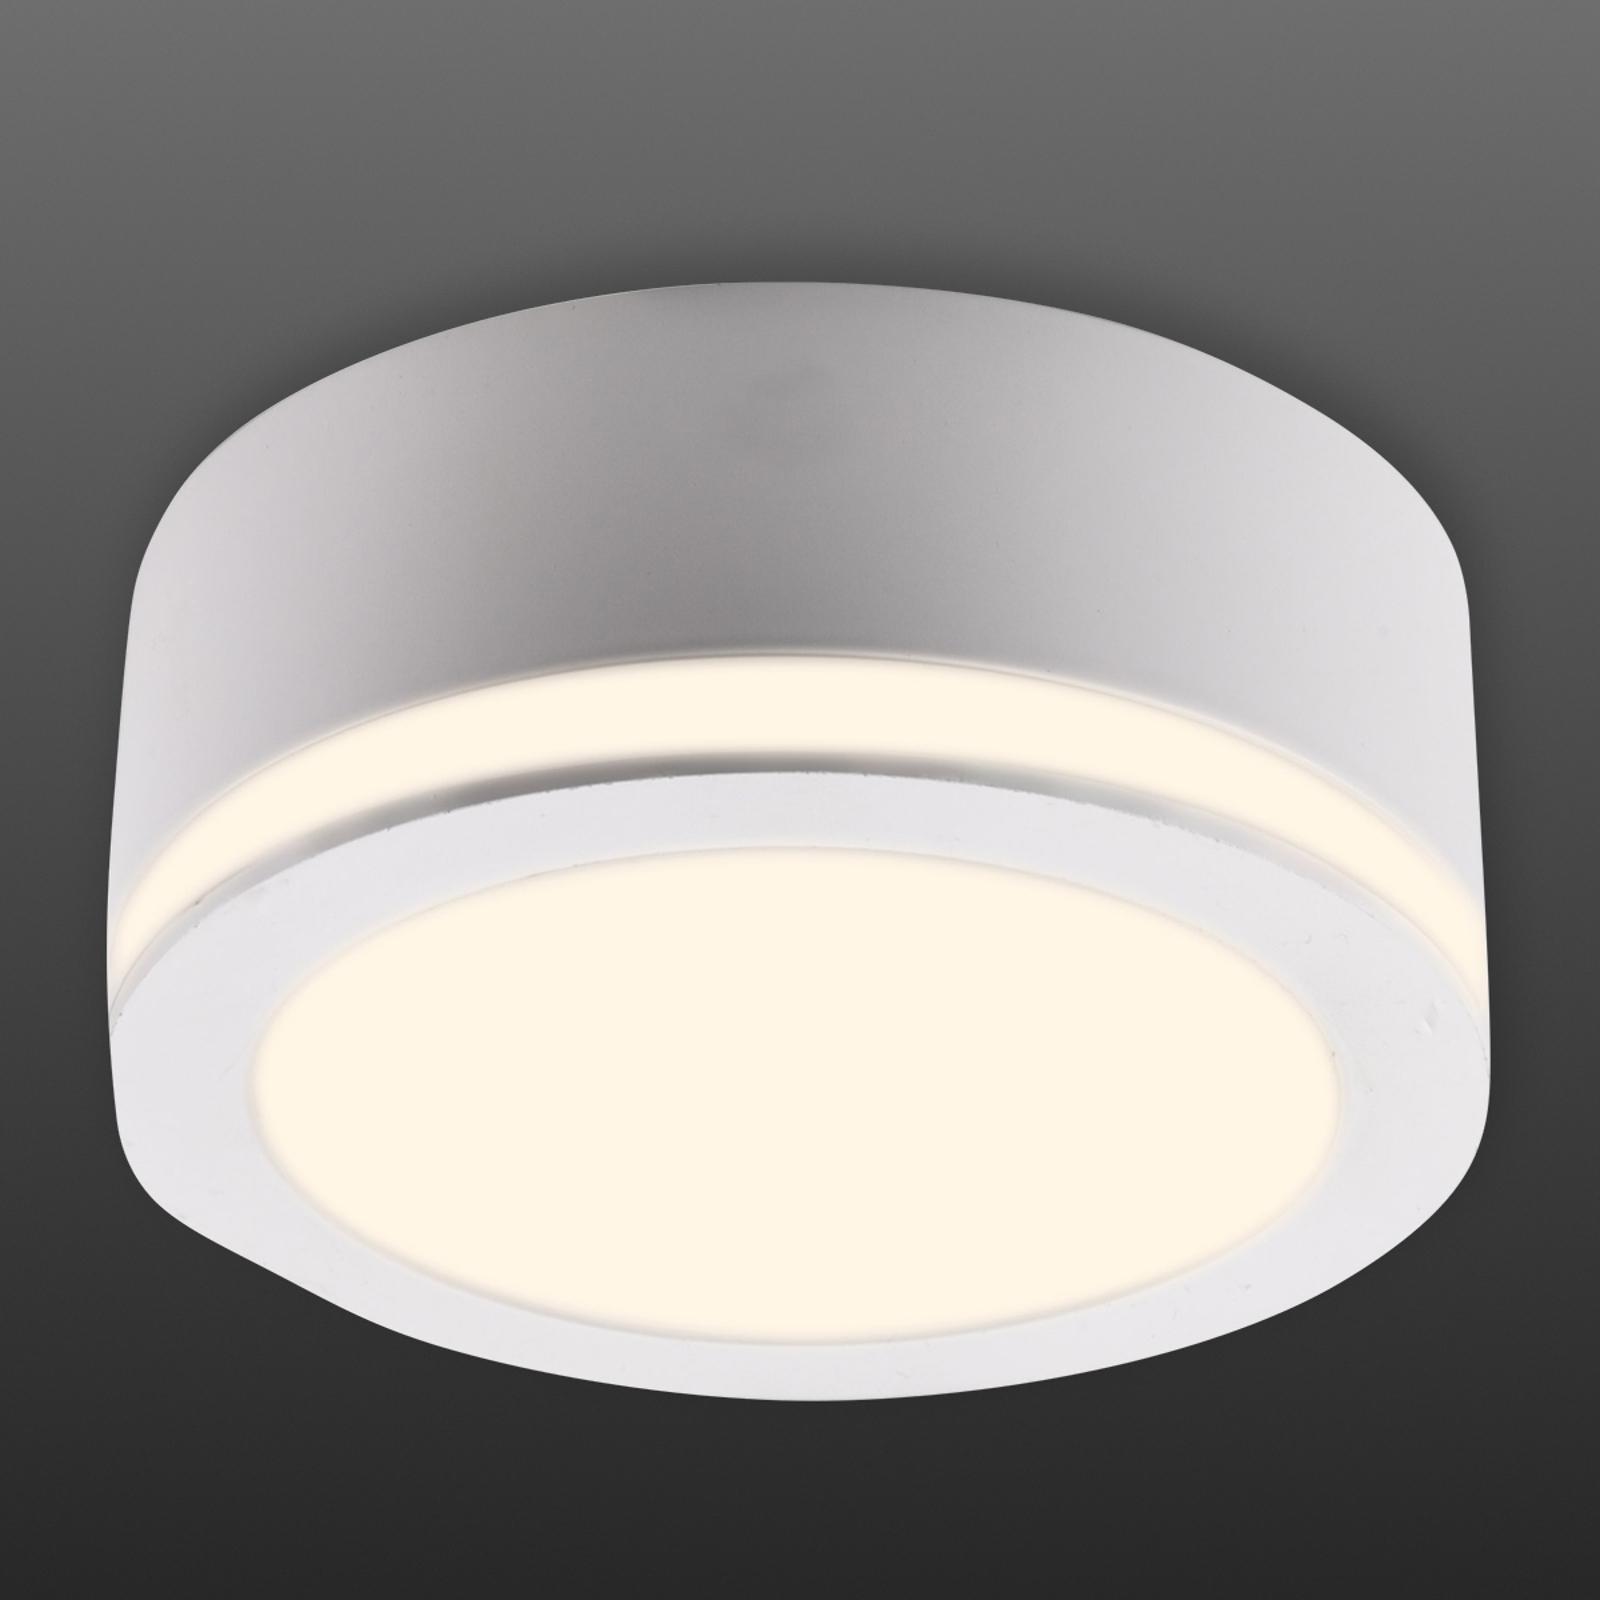 Biala - pyöreä LED-spotti, Ø 10 cm